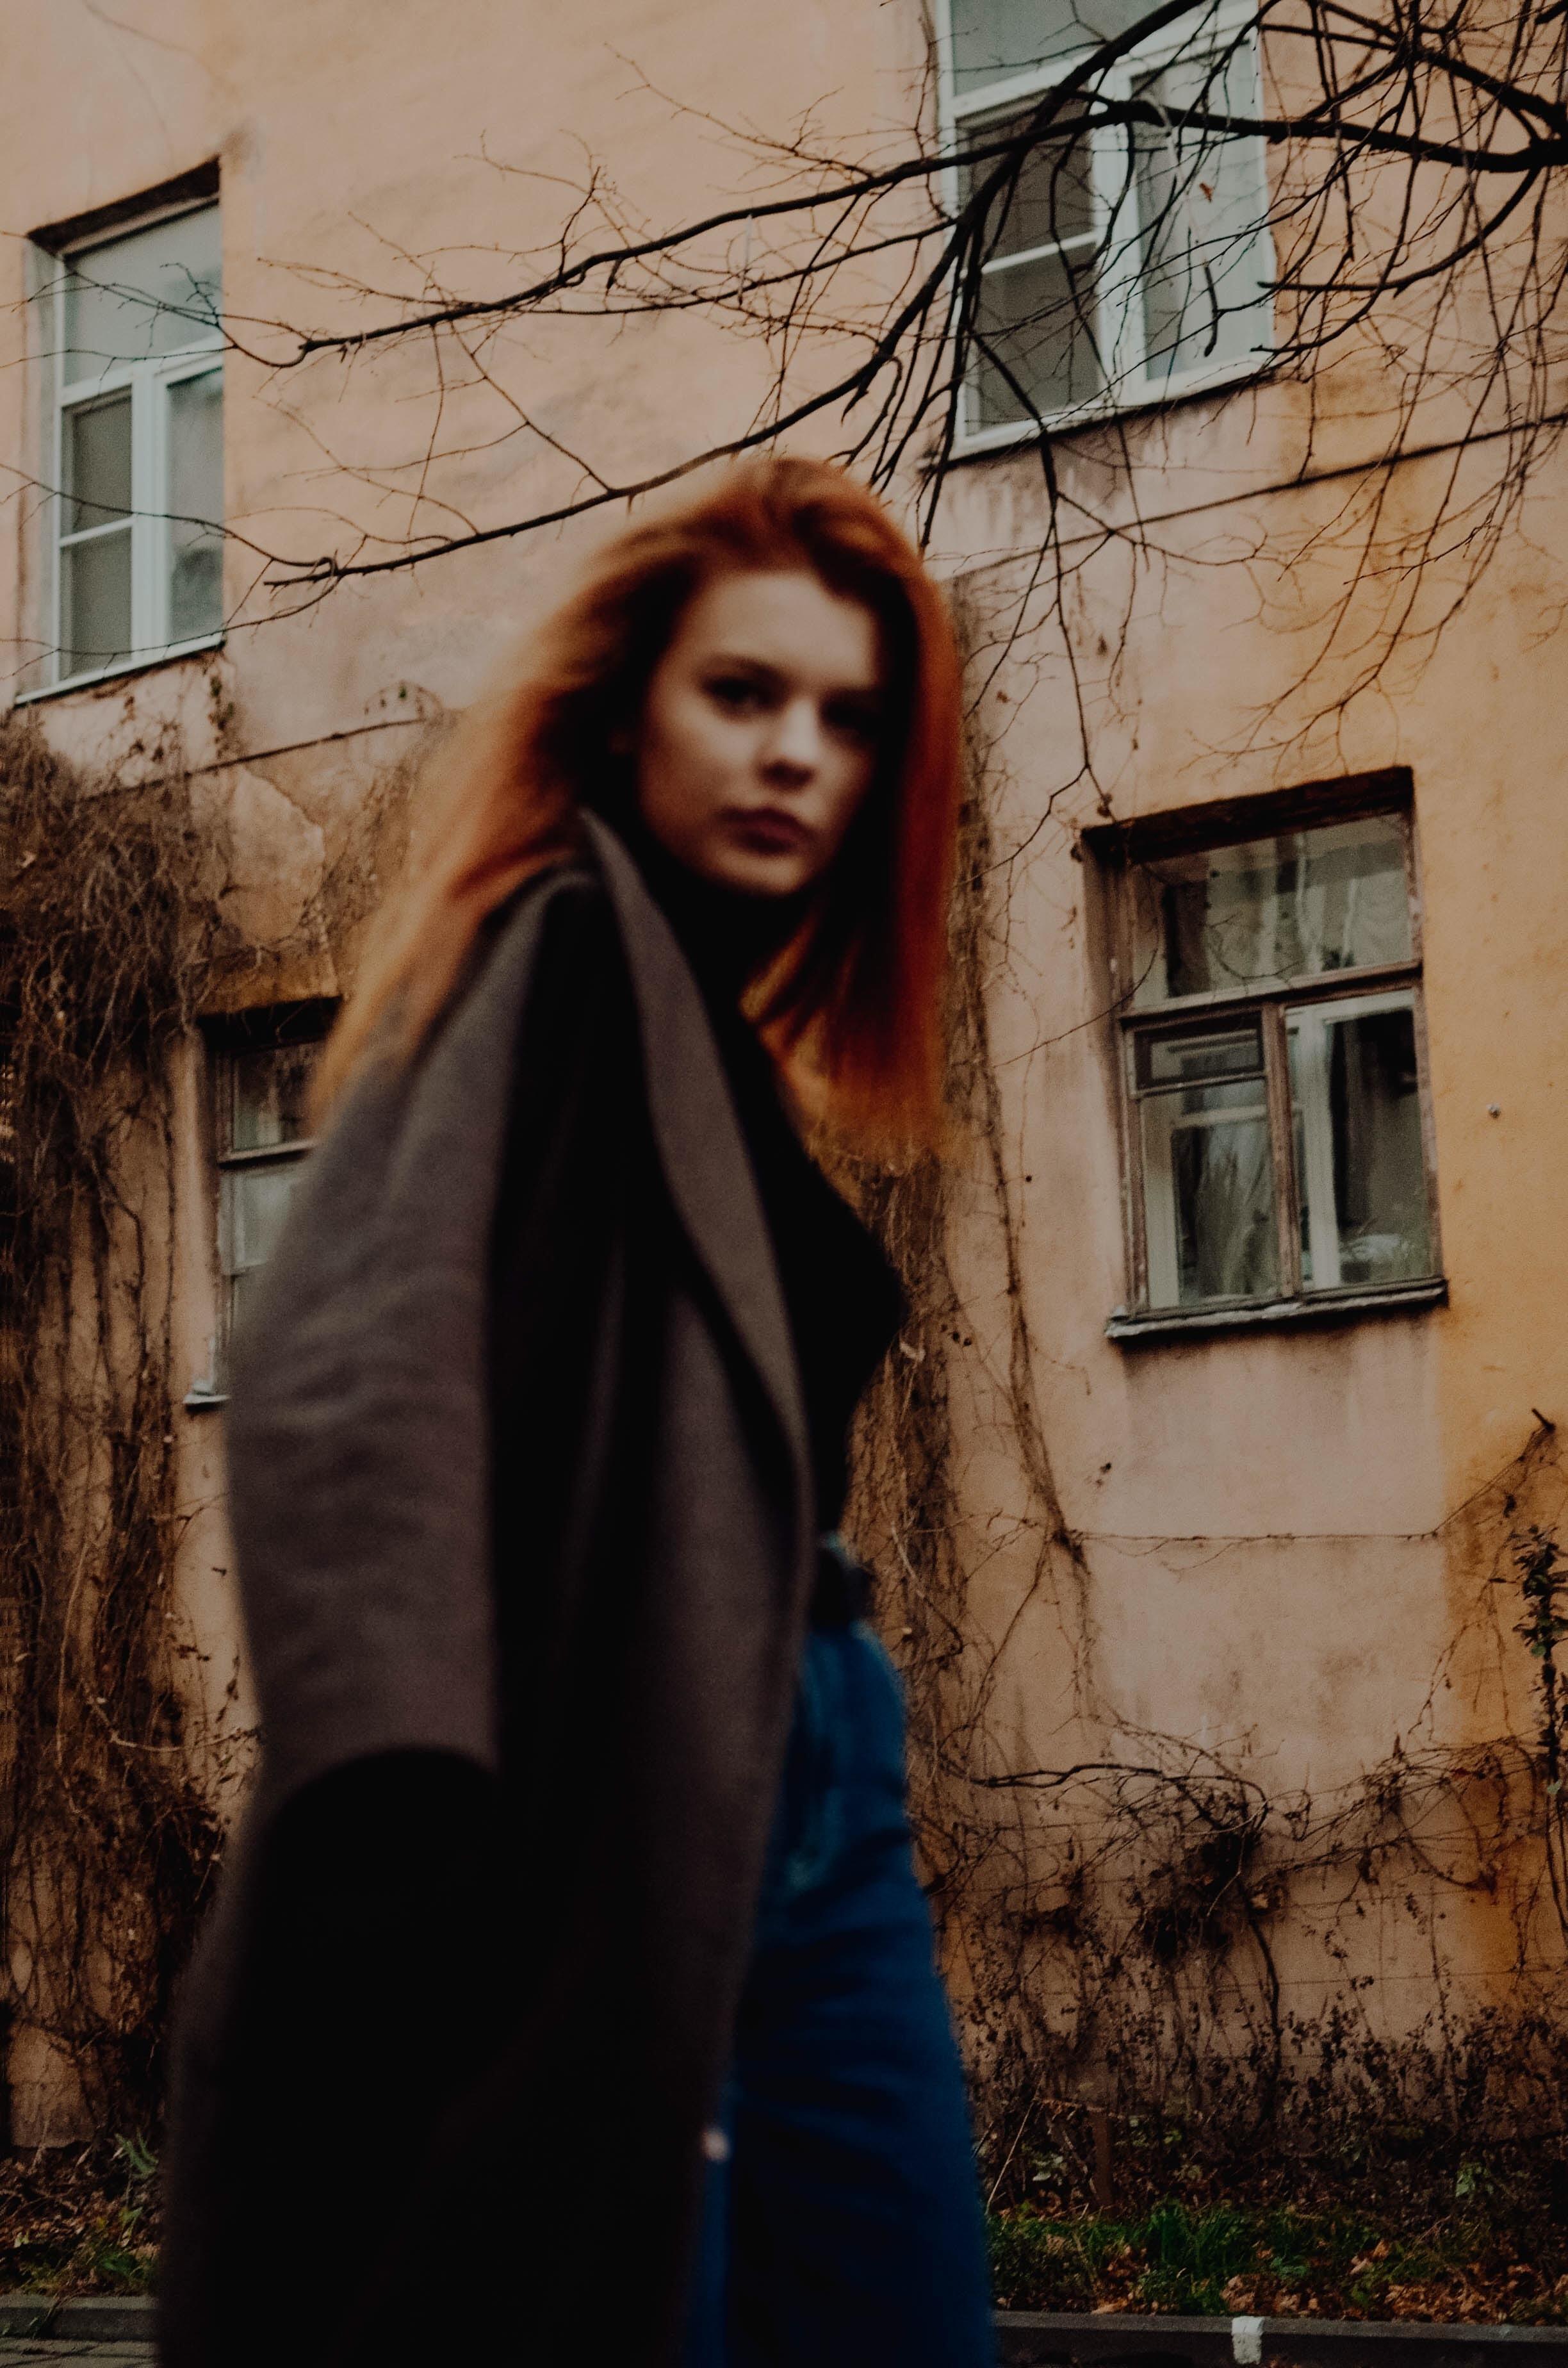 woman wearing coat